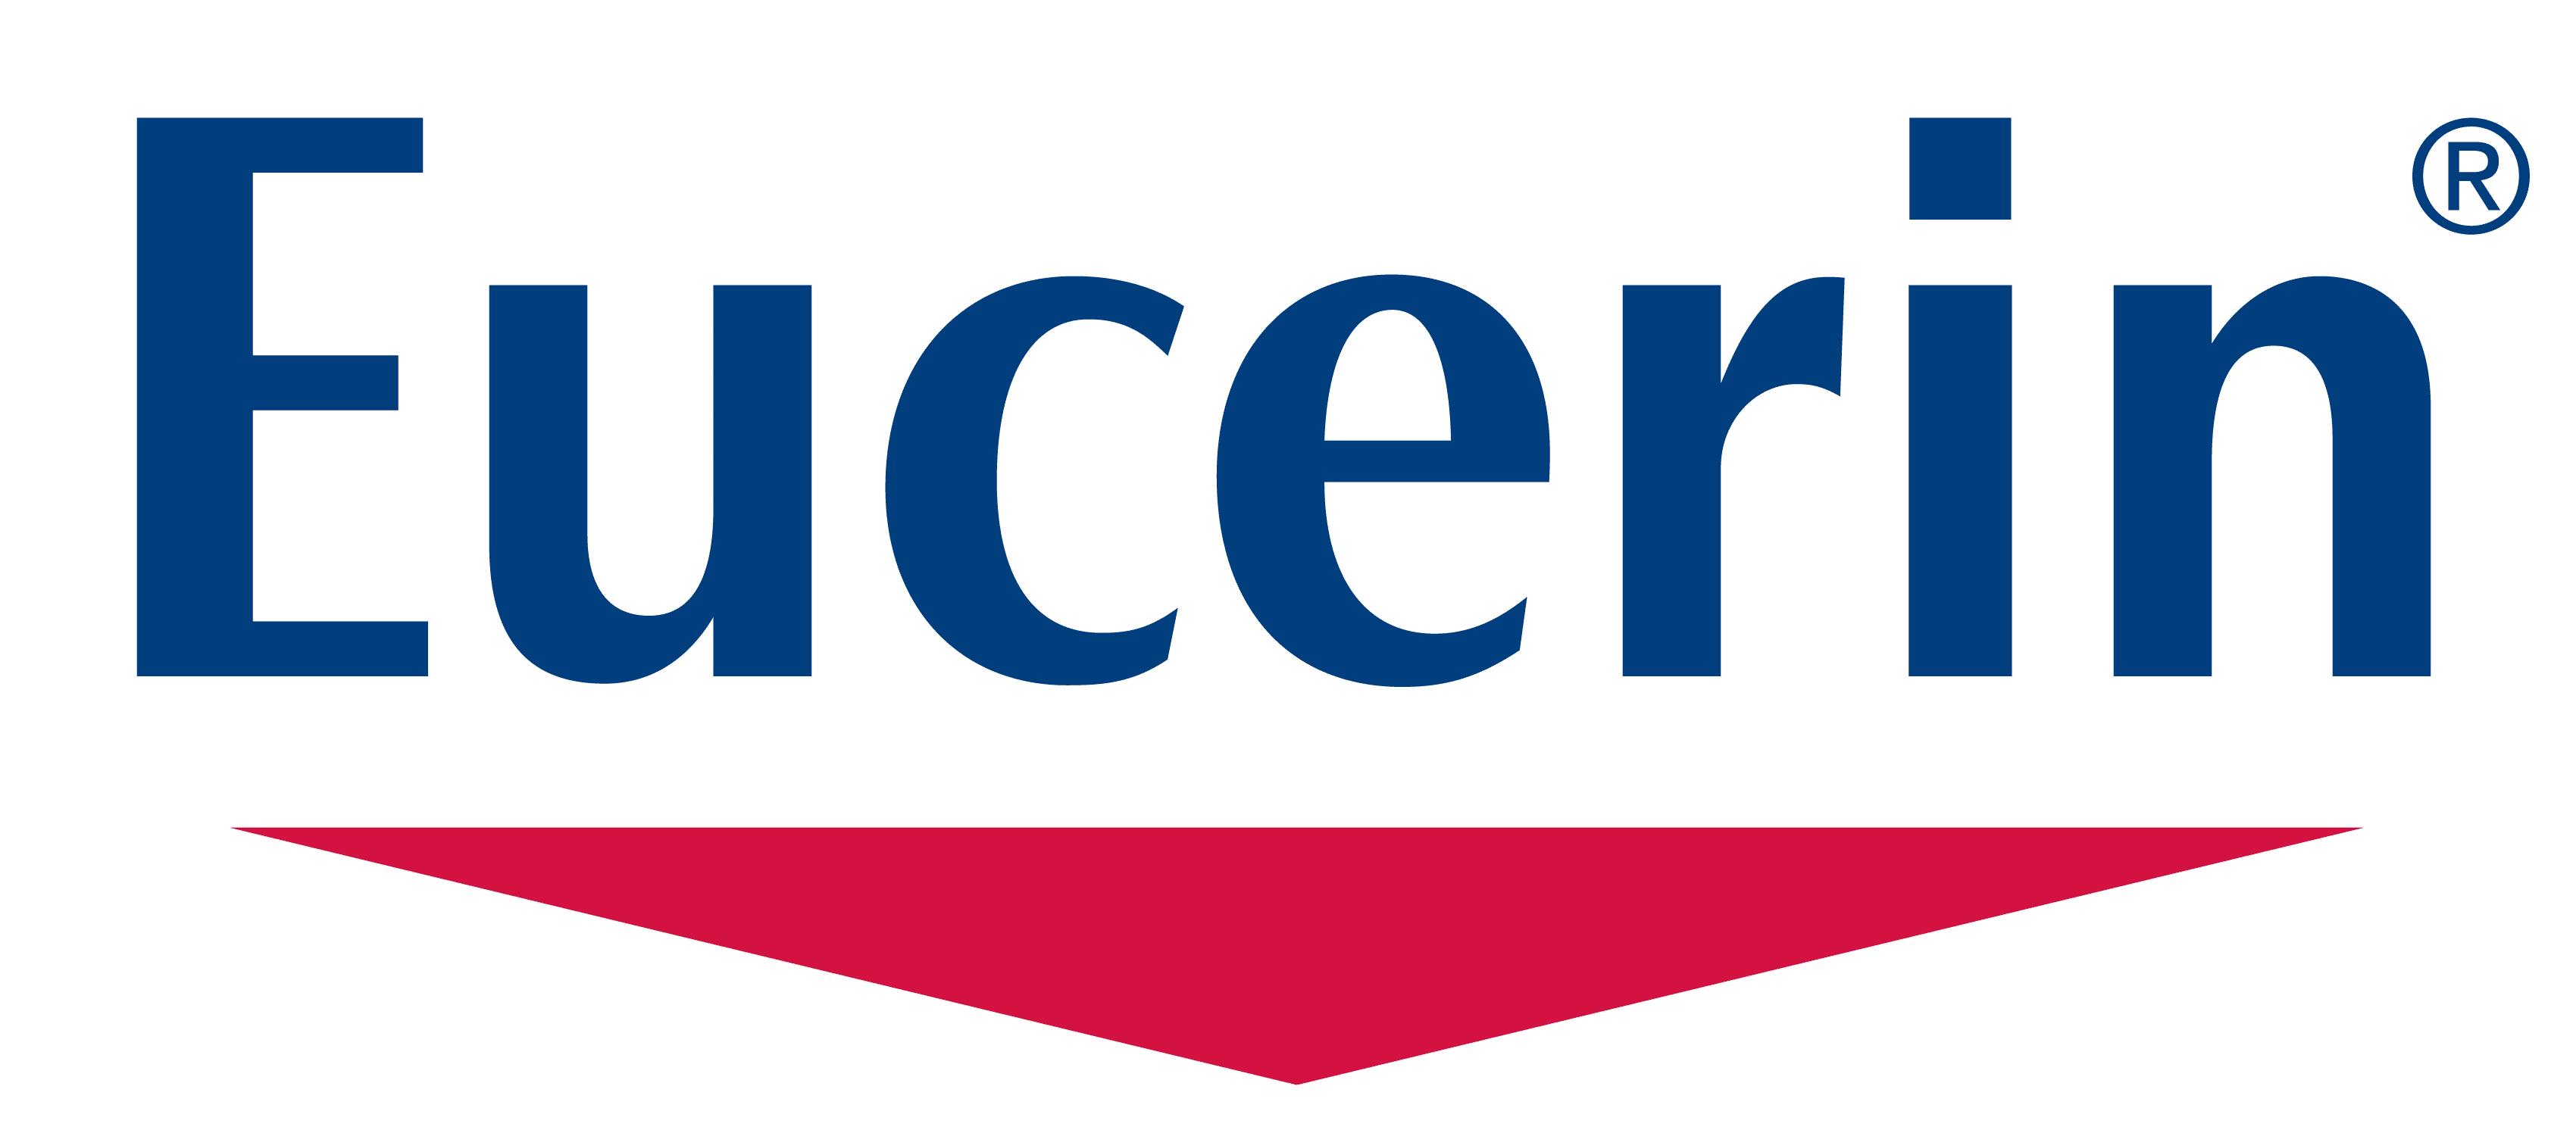 Eucerin Logo Logotype - Ljekarna Online